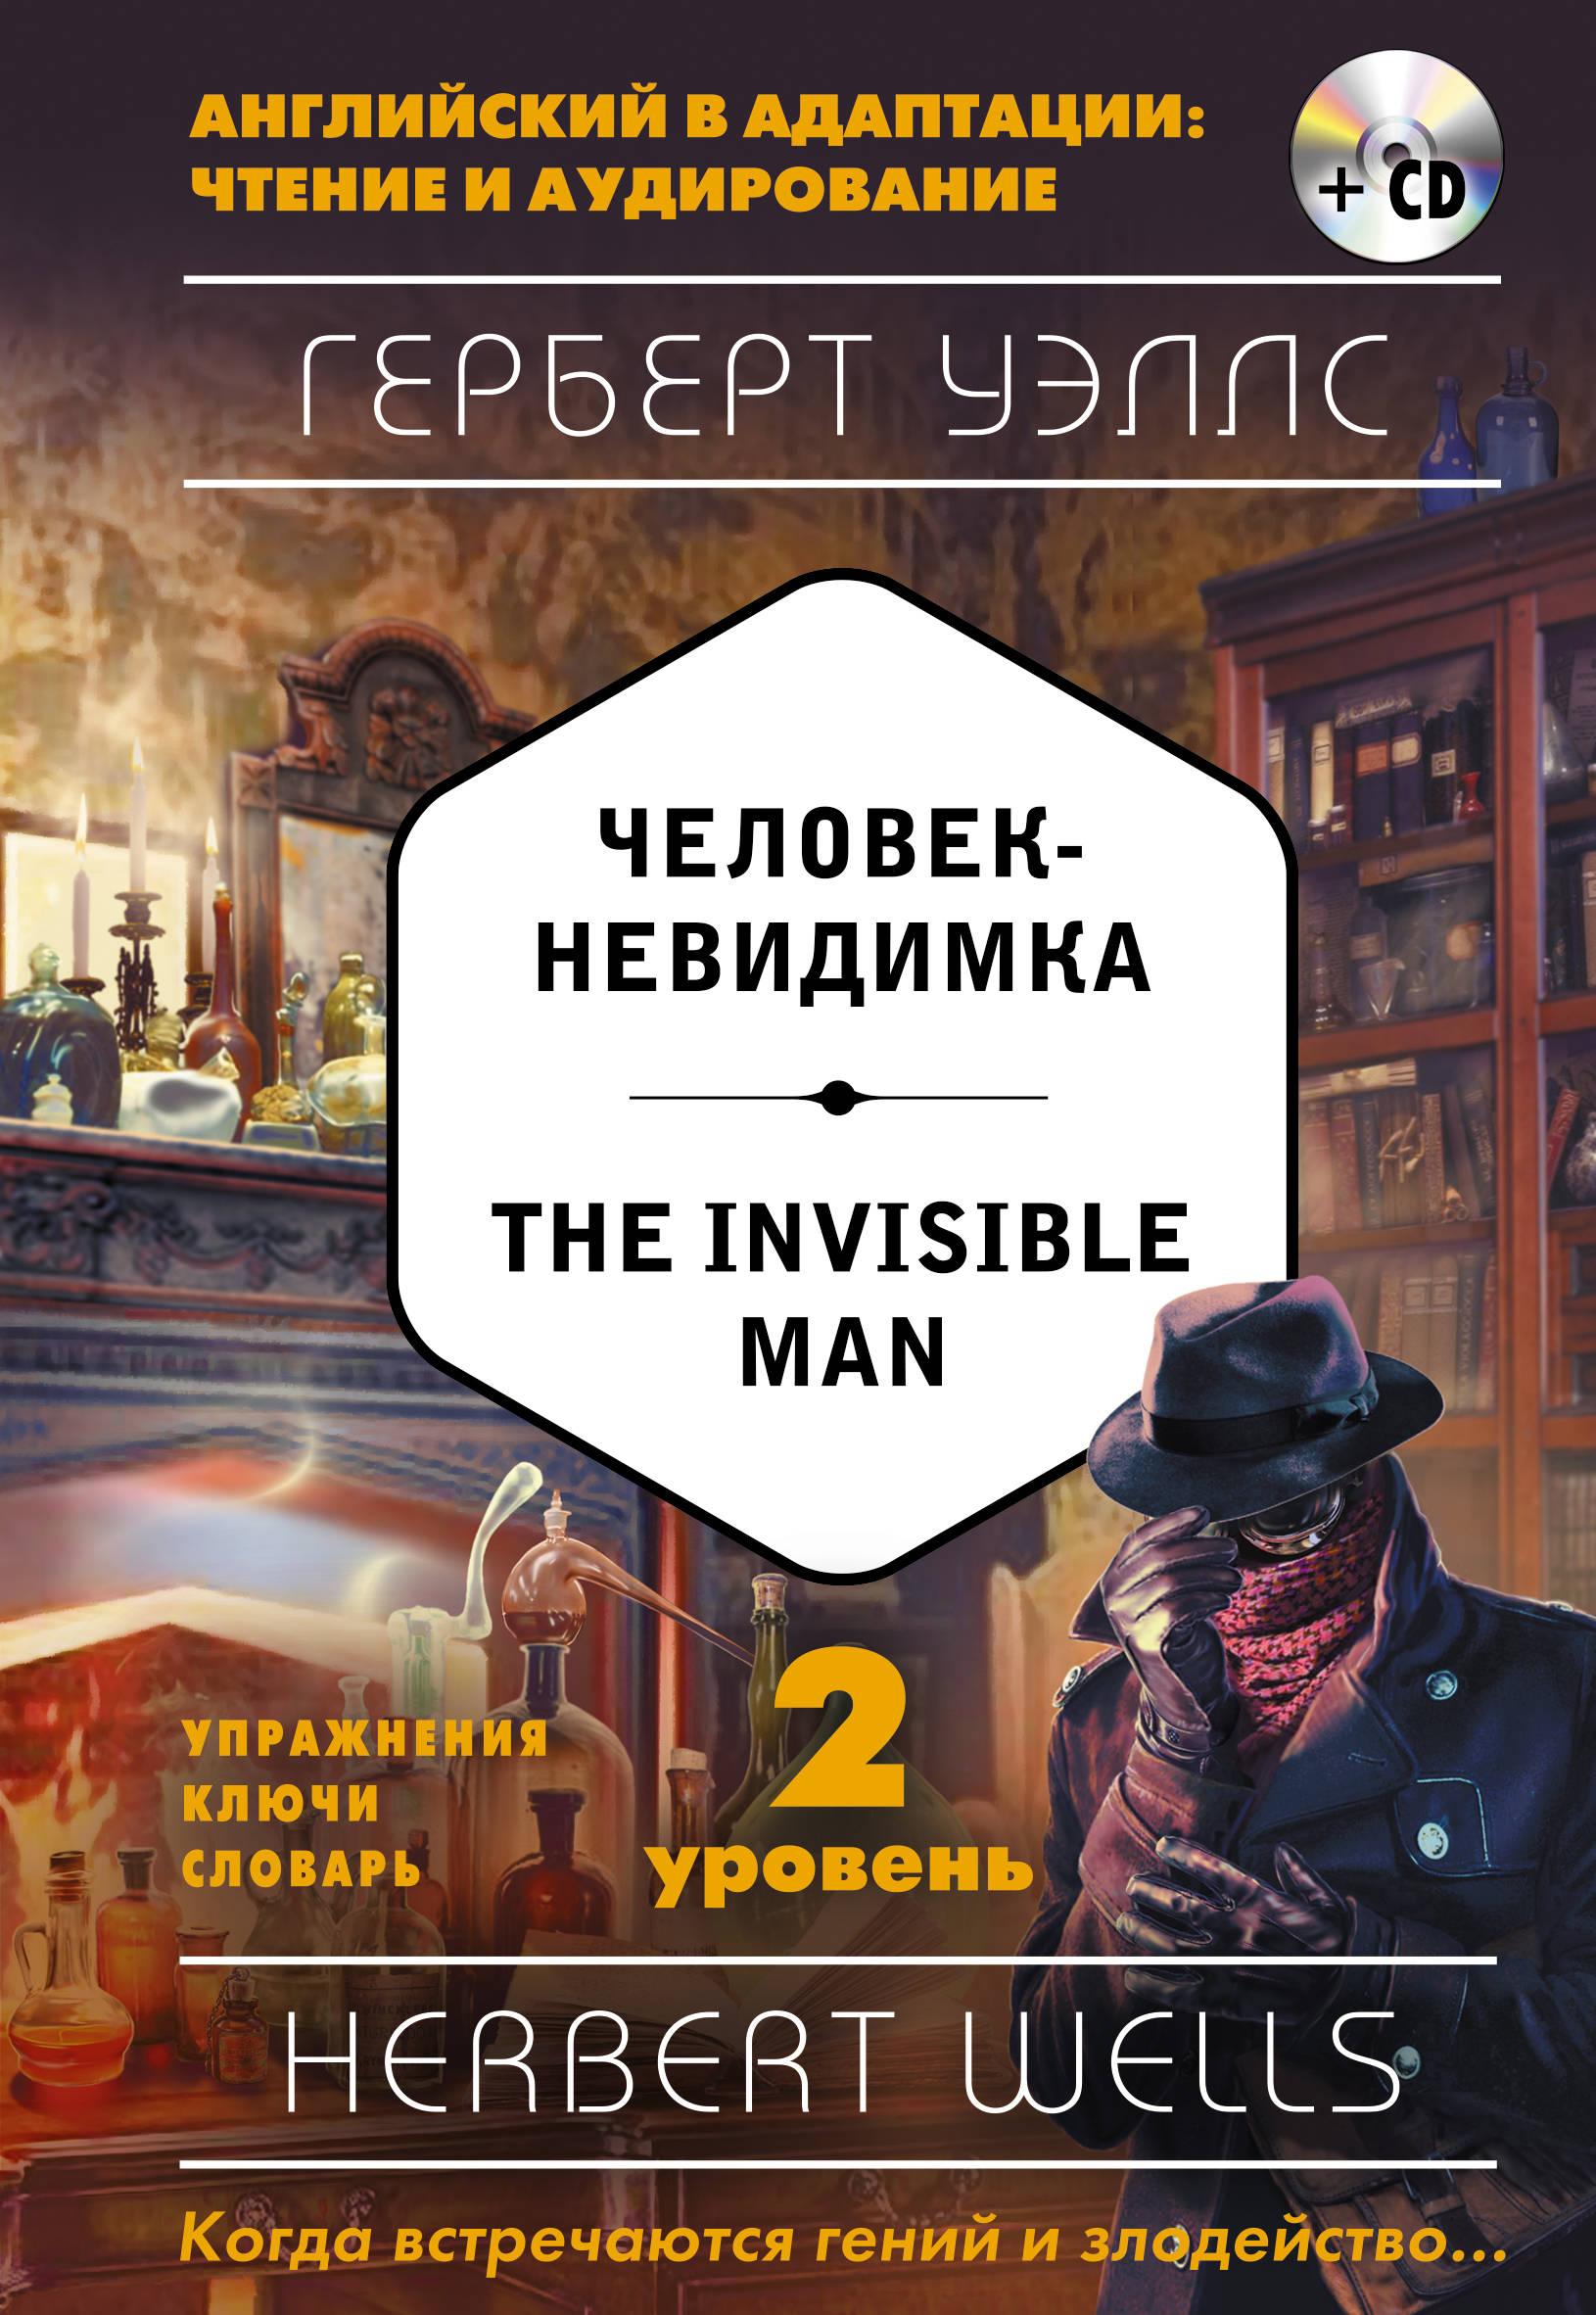 Герберт Уэллс The Invisible Man / Человек-невидимка. 2-й уровень (+ CD) the invisible man level 5 cd